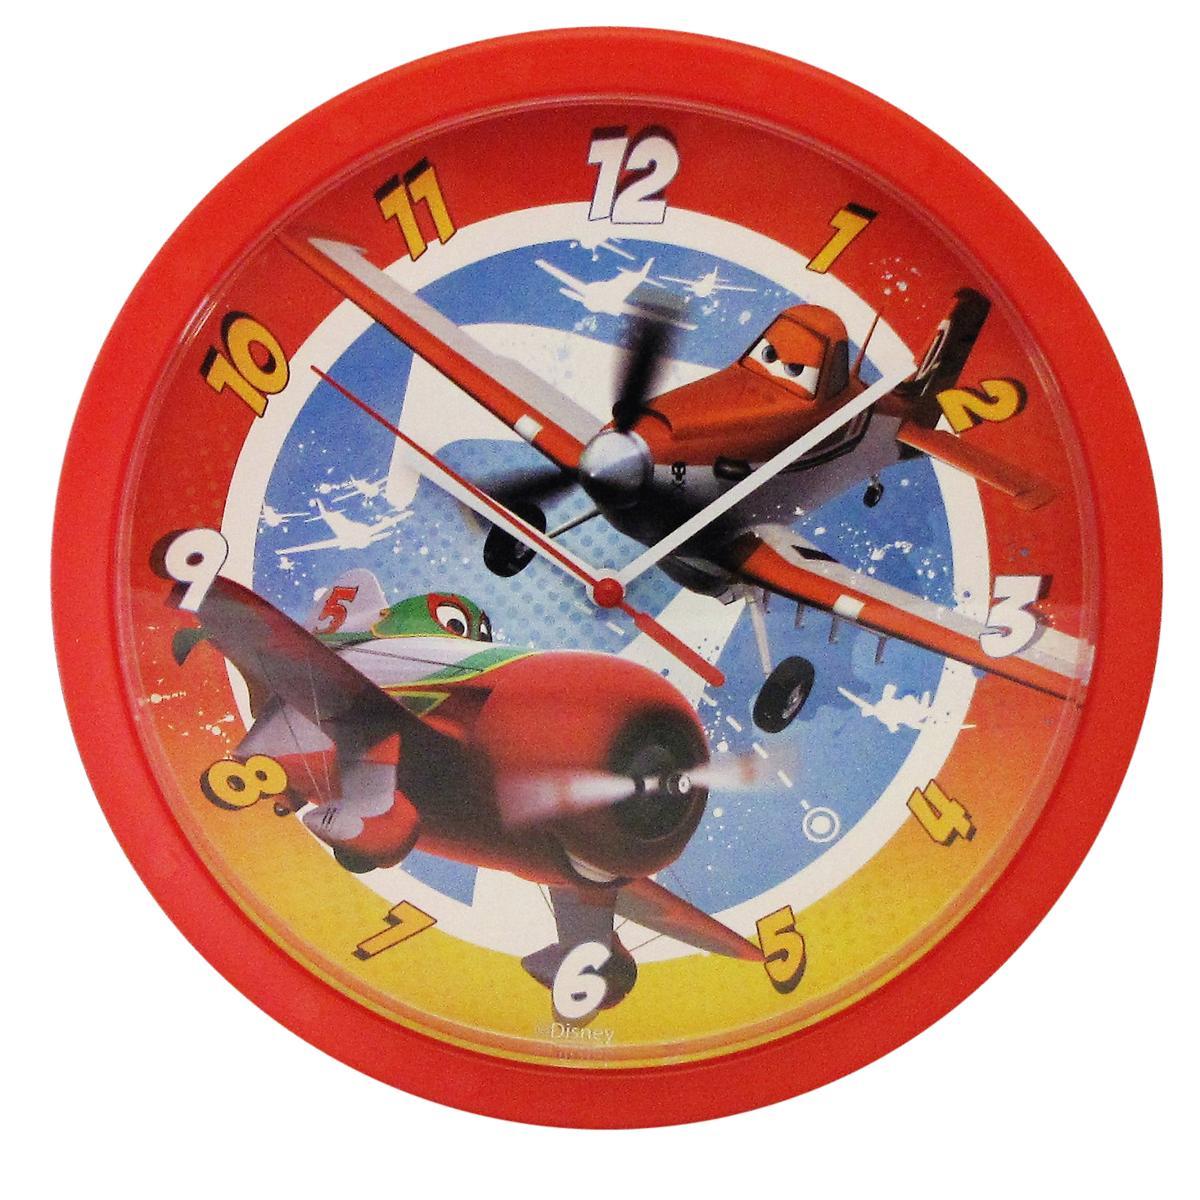 Disney wall clock 25cm round 6 designs cars mickey minnie princess sentinel disney wall clock 25cm round 6 designs cars mickey minnie princess kids room amipublicfo Choice Image